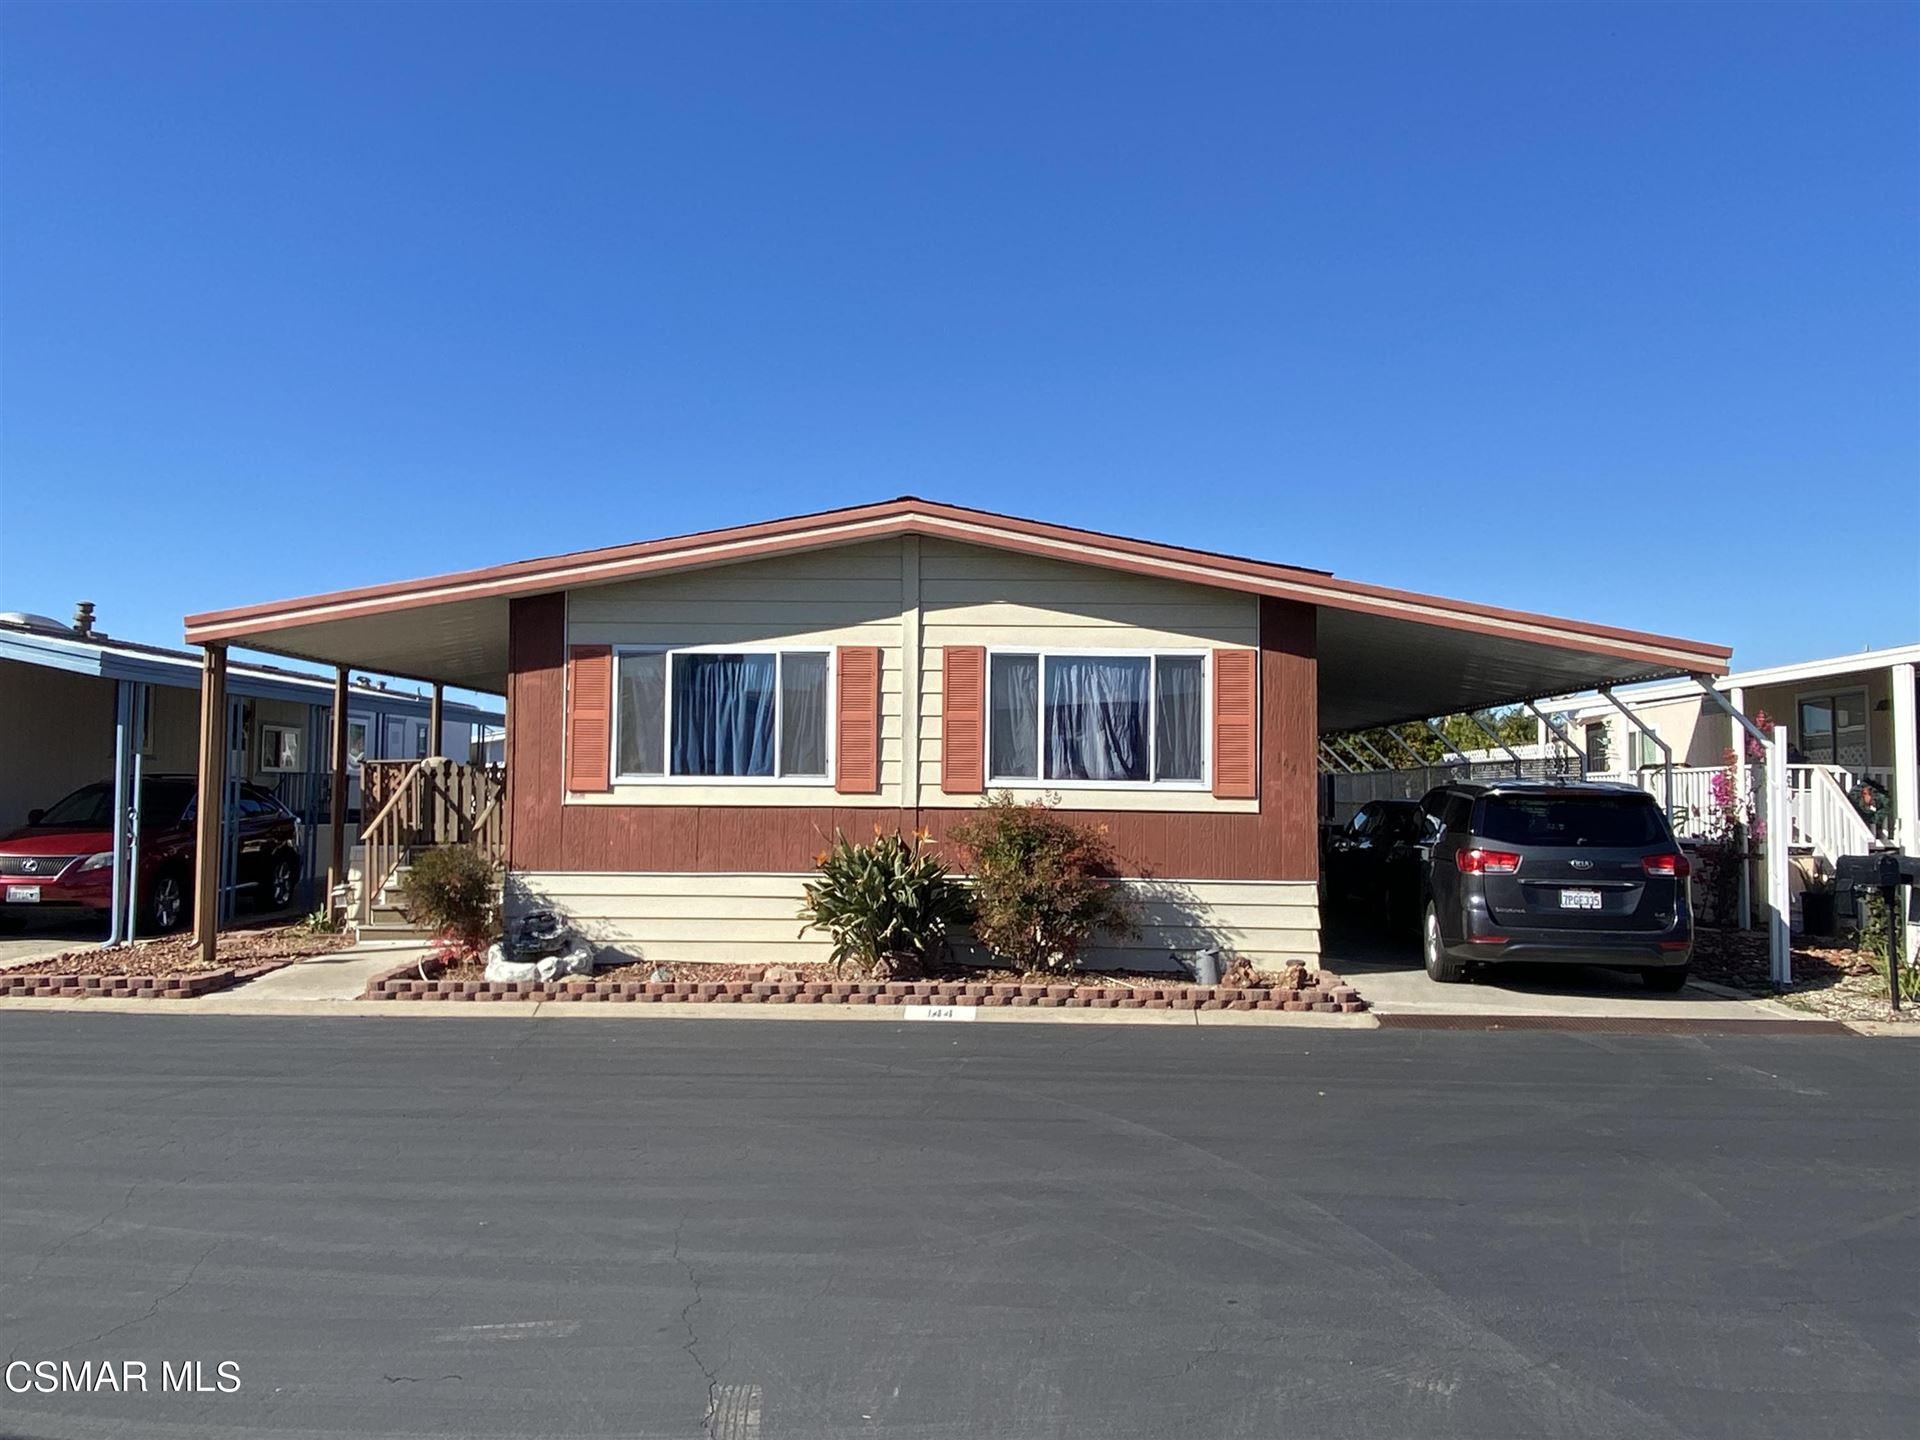 15750 Arroyo Drive #144, Moorpark, CA 93021 - MLS#: 221000020